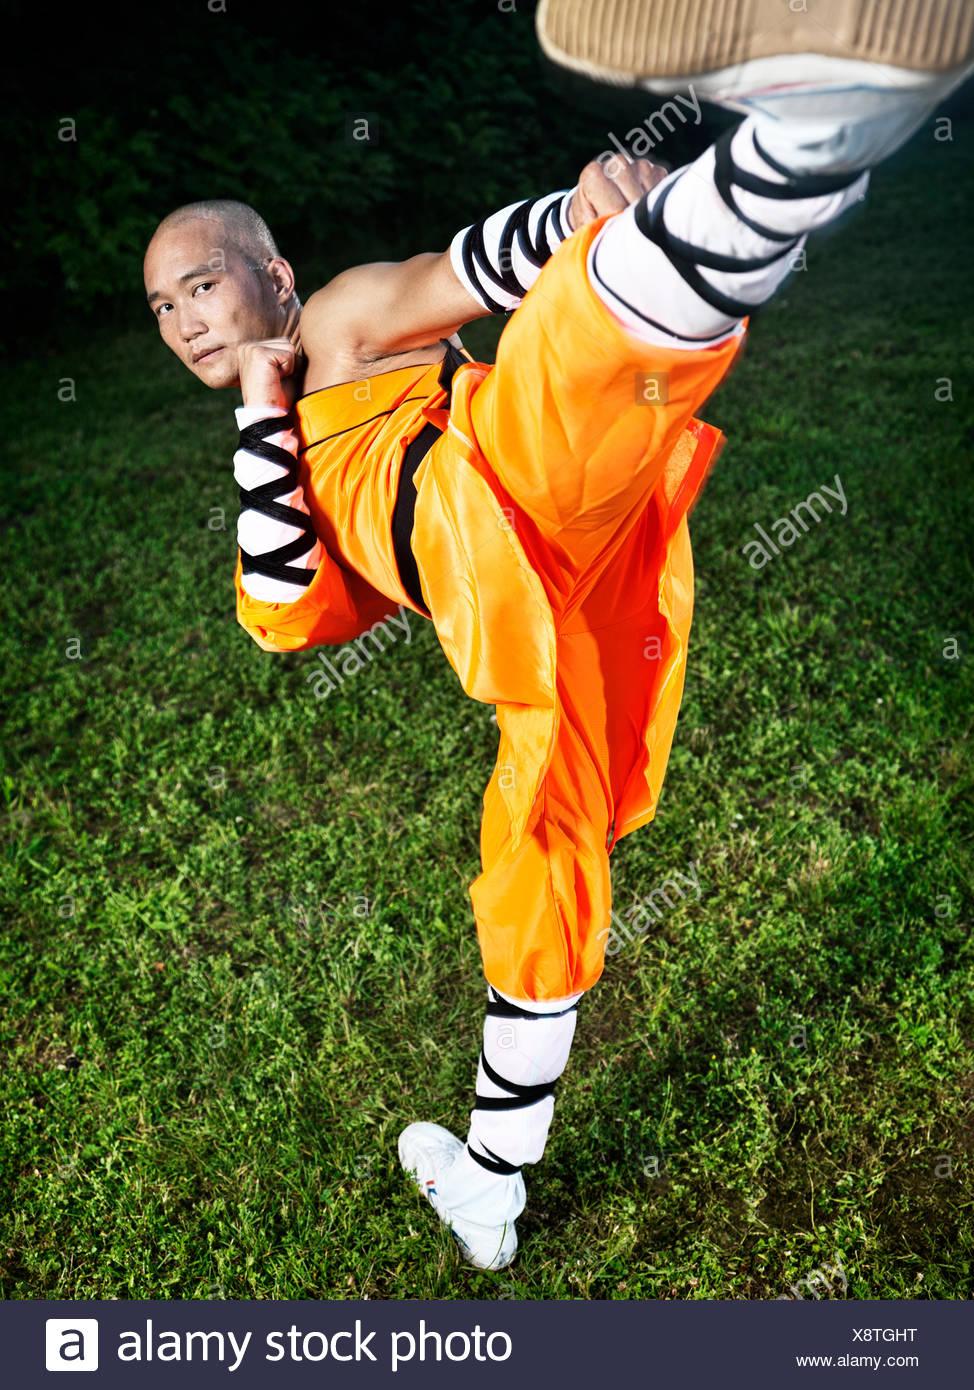 Shaolin monaco guerriero facendo Chuai Tui calcio laterale Immagini Stock